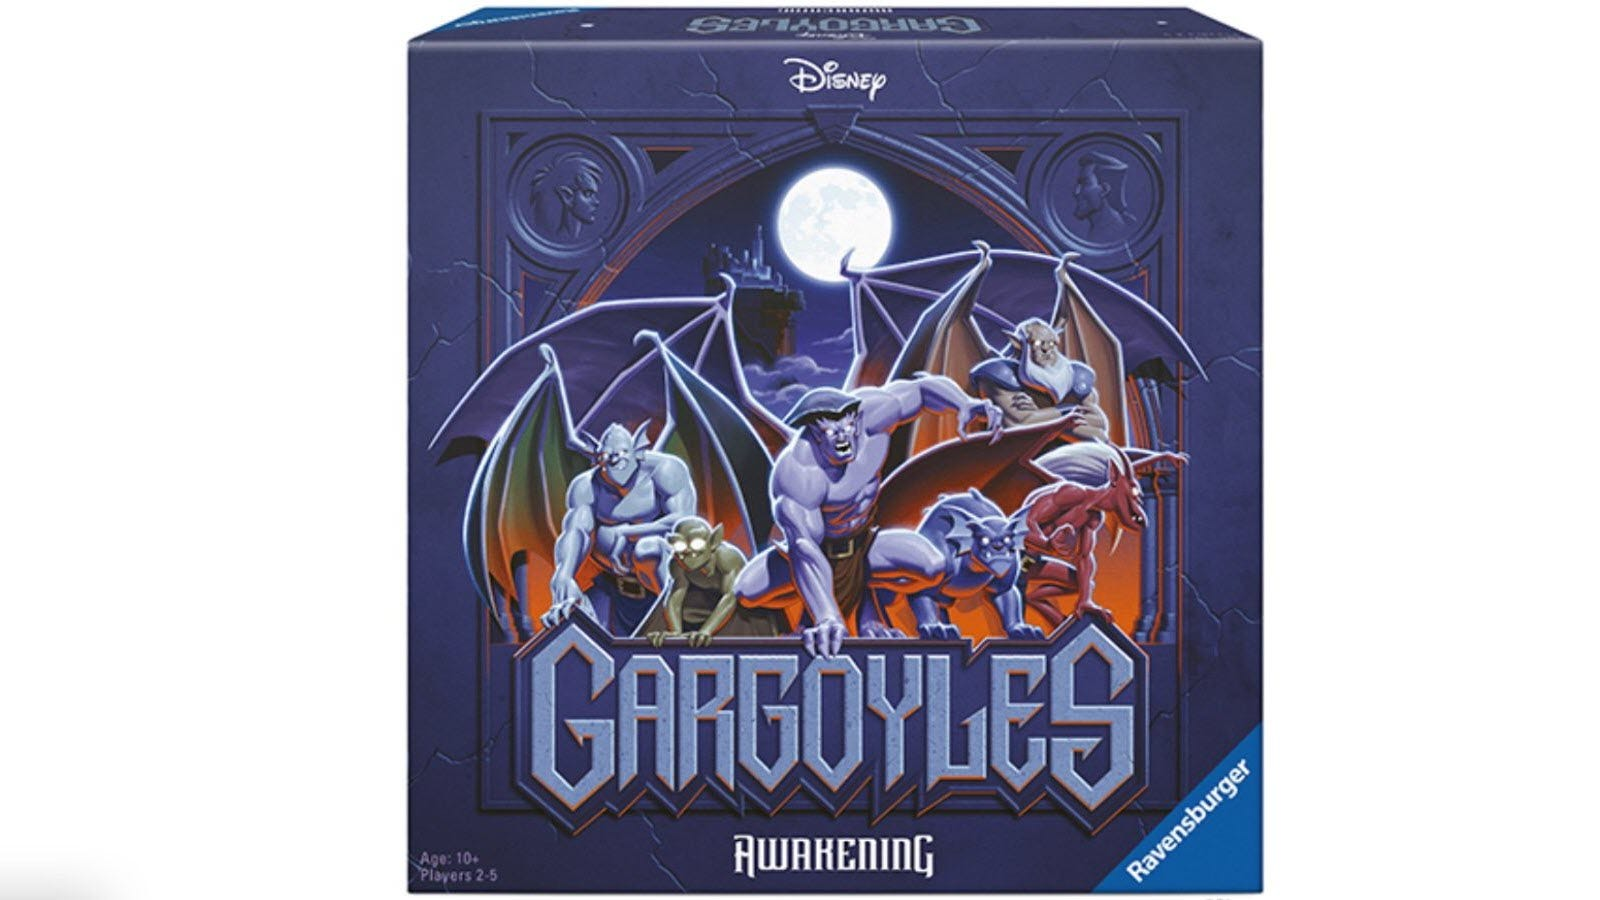 Disney's 'Gargoyles' Lives Again as a New Co-Op Board Game thumbnail